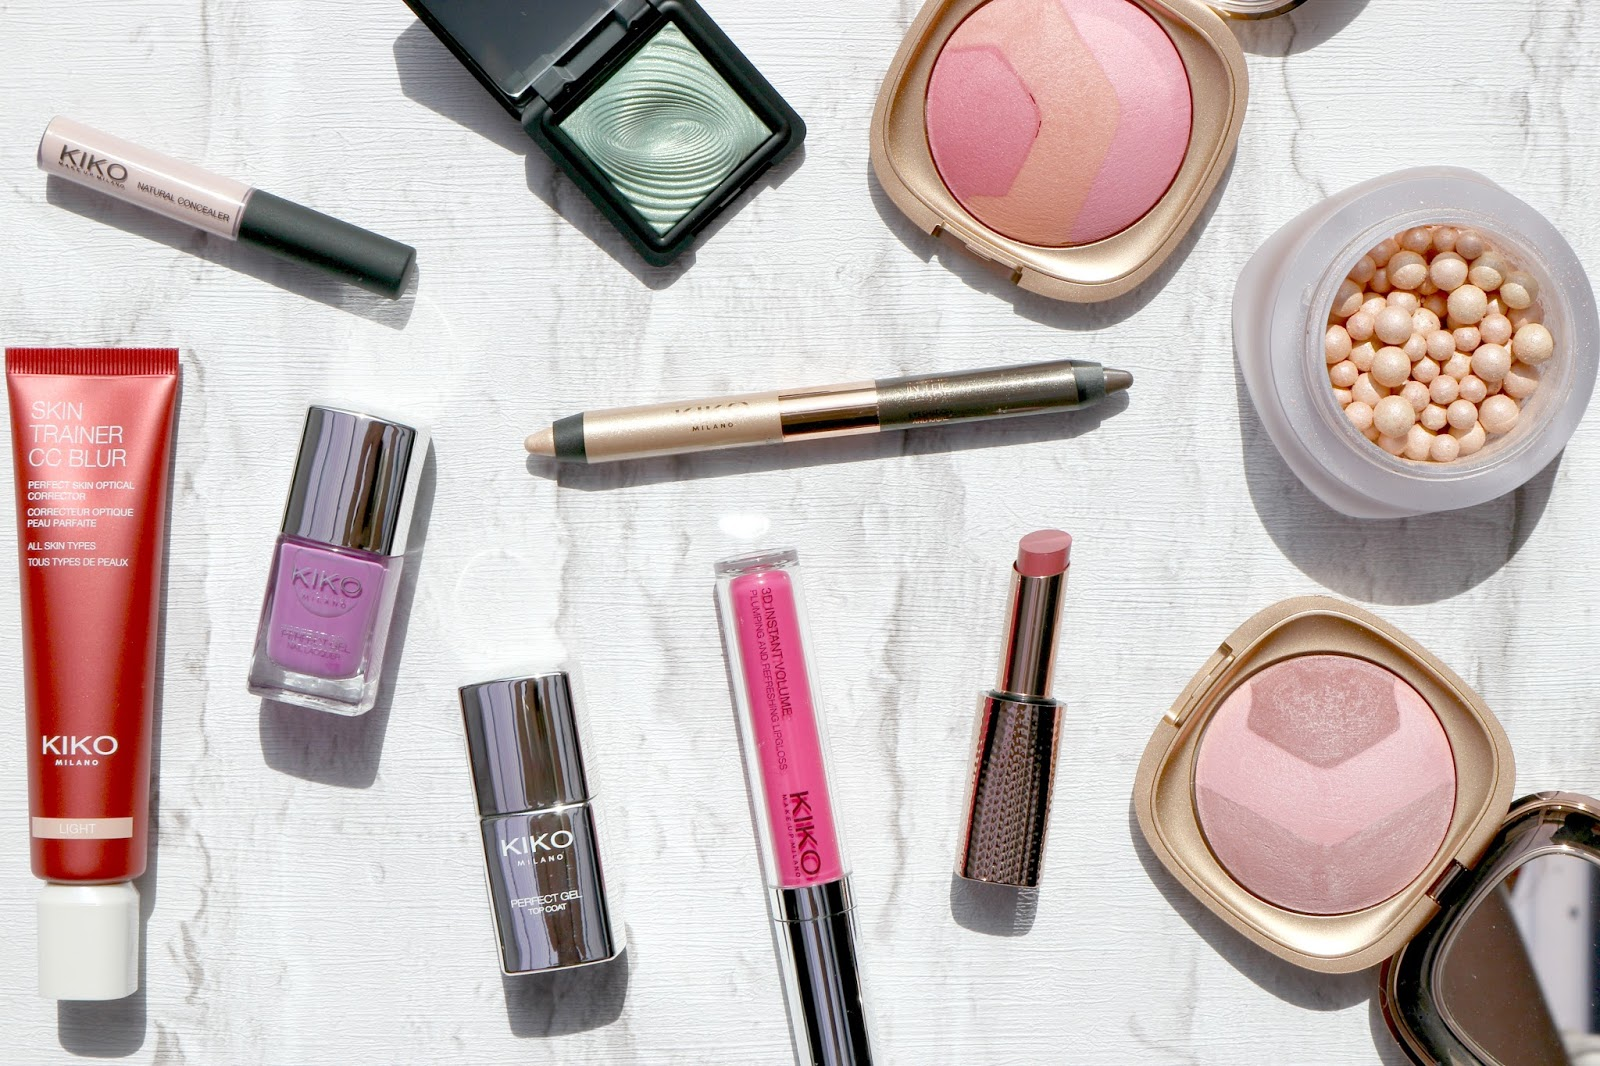 KIKO Haul Cosmetics Makeup Skincare Beauty Blog